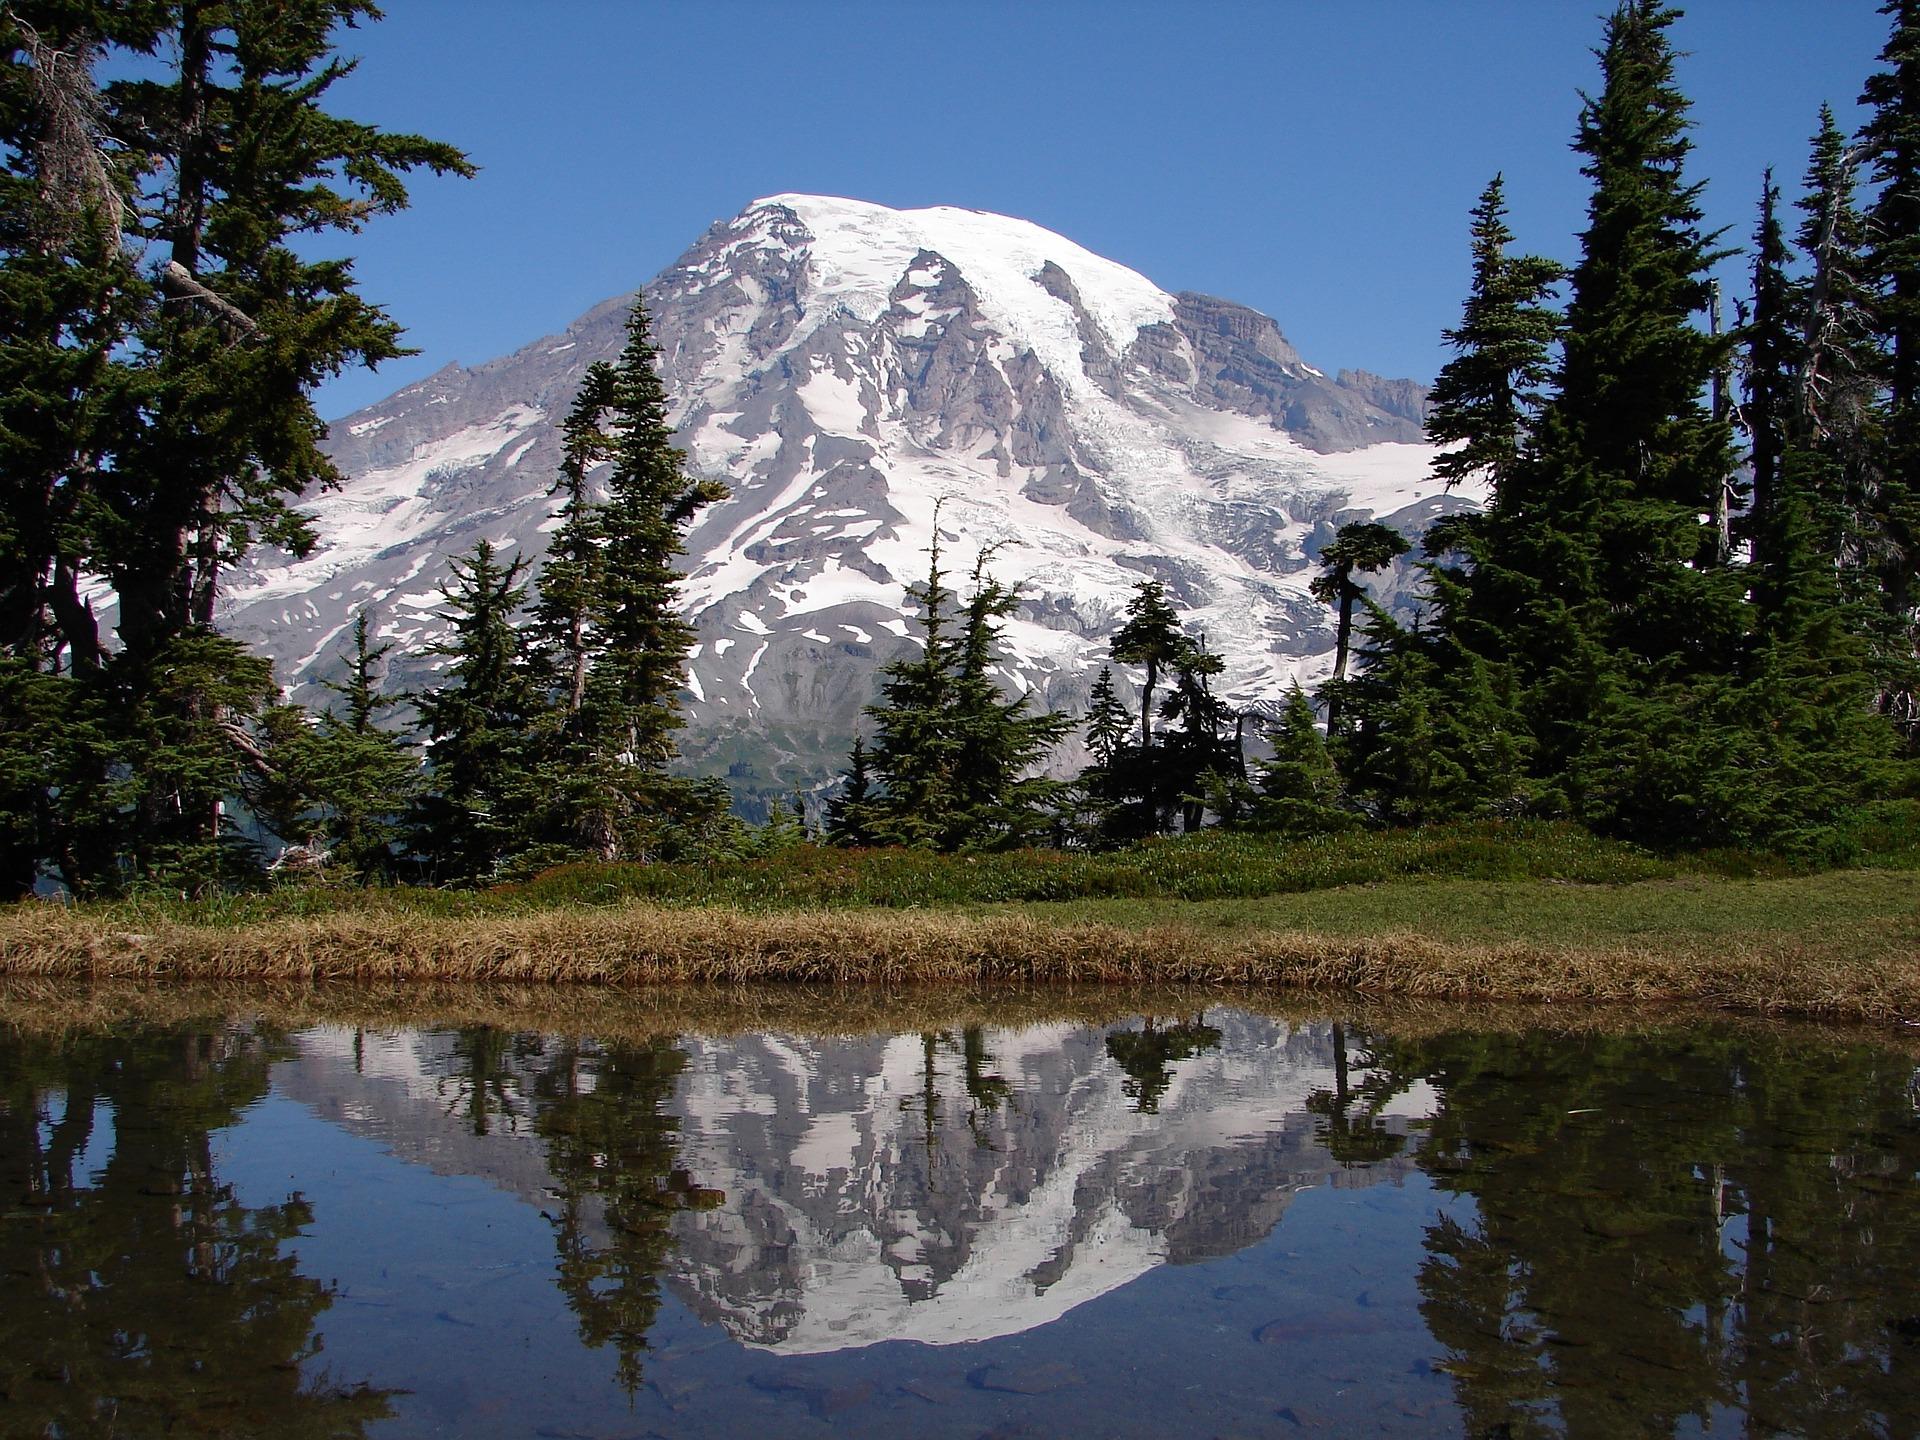 Mount Rainier reflected in Lake Tipsoo. Photo credit:    Pixabay